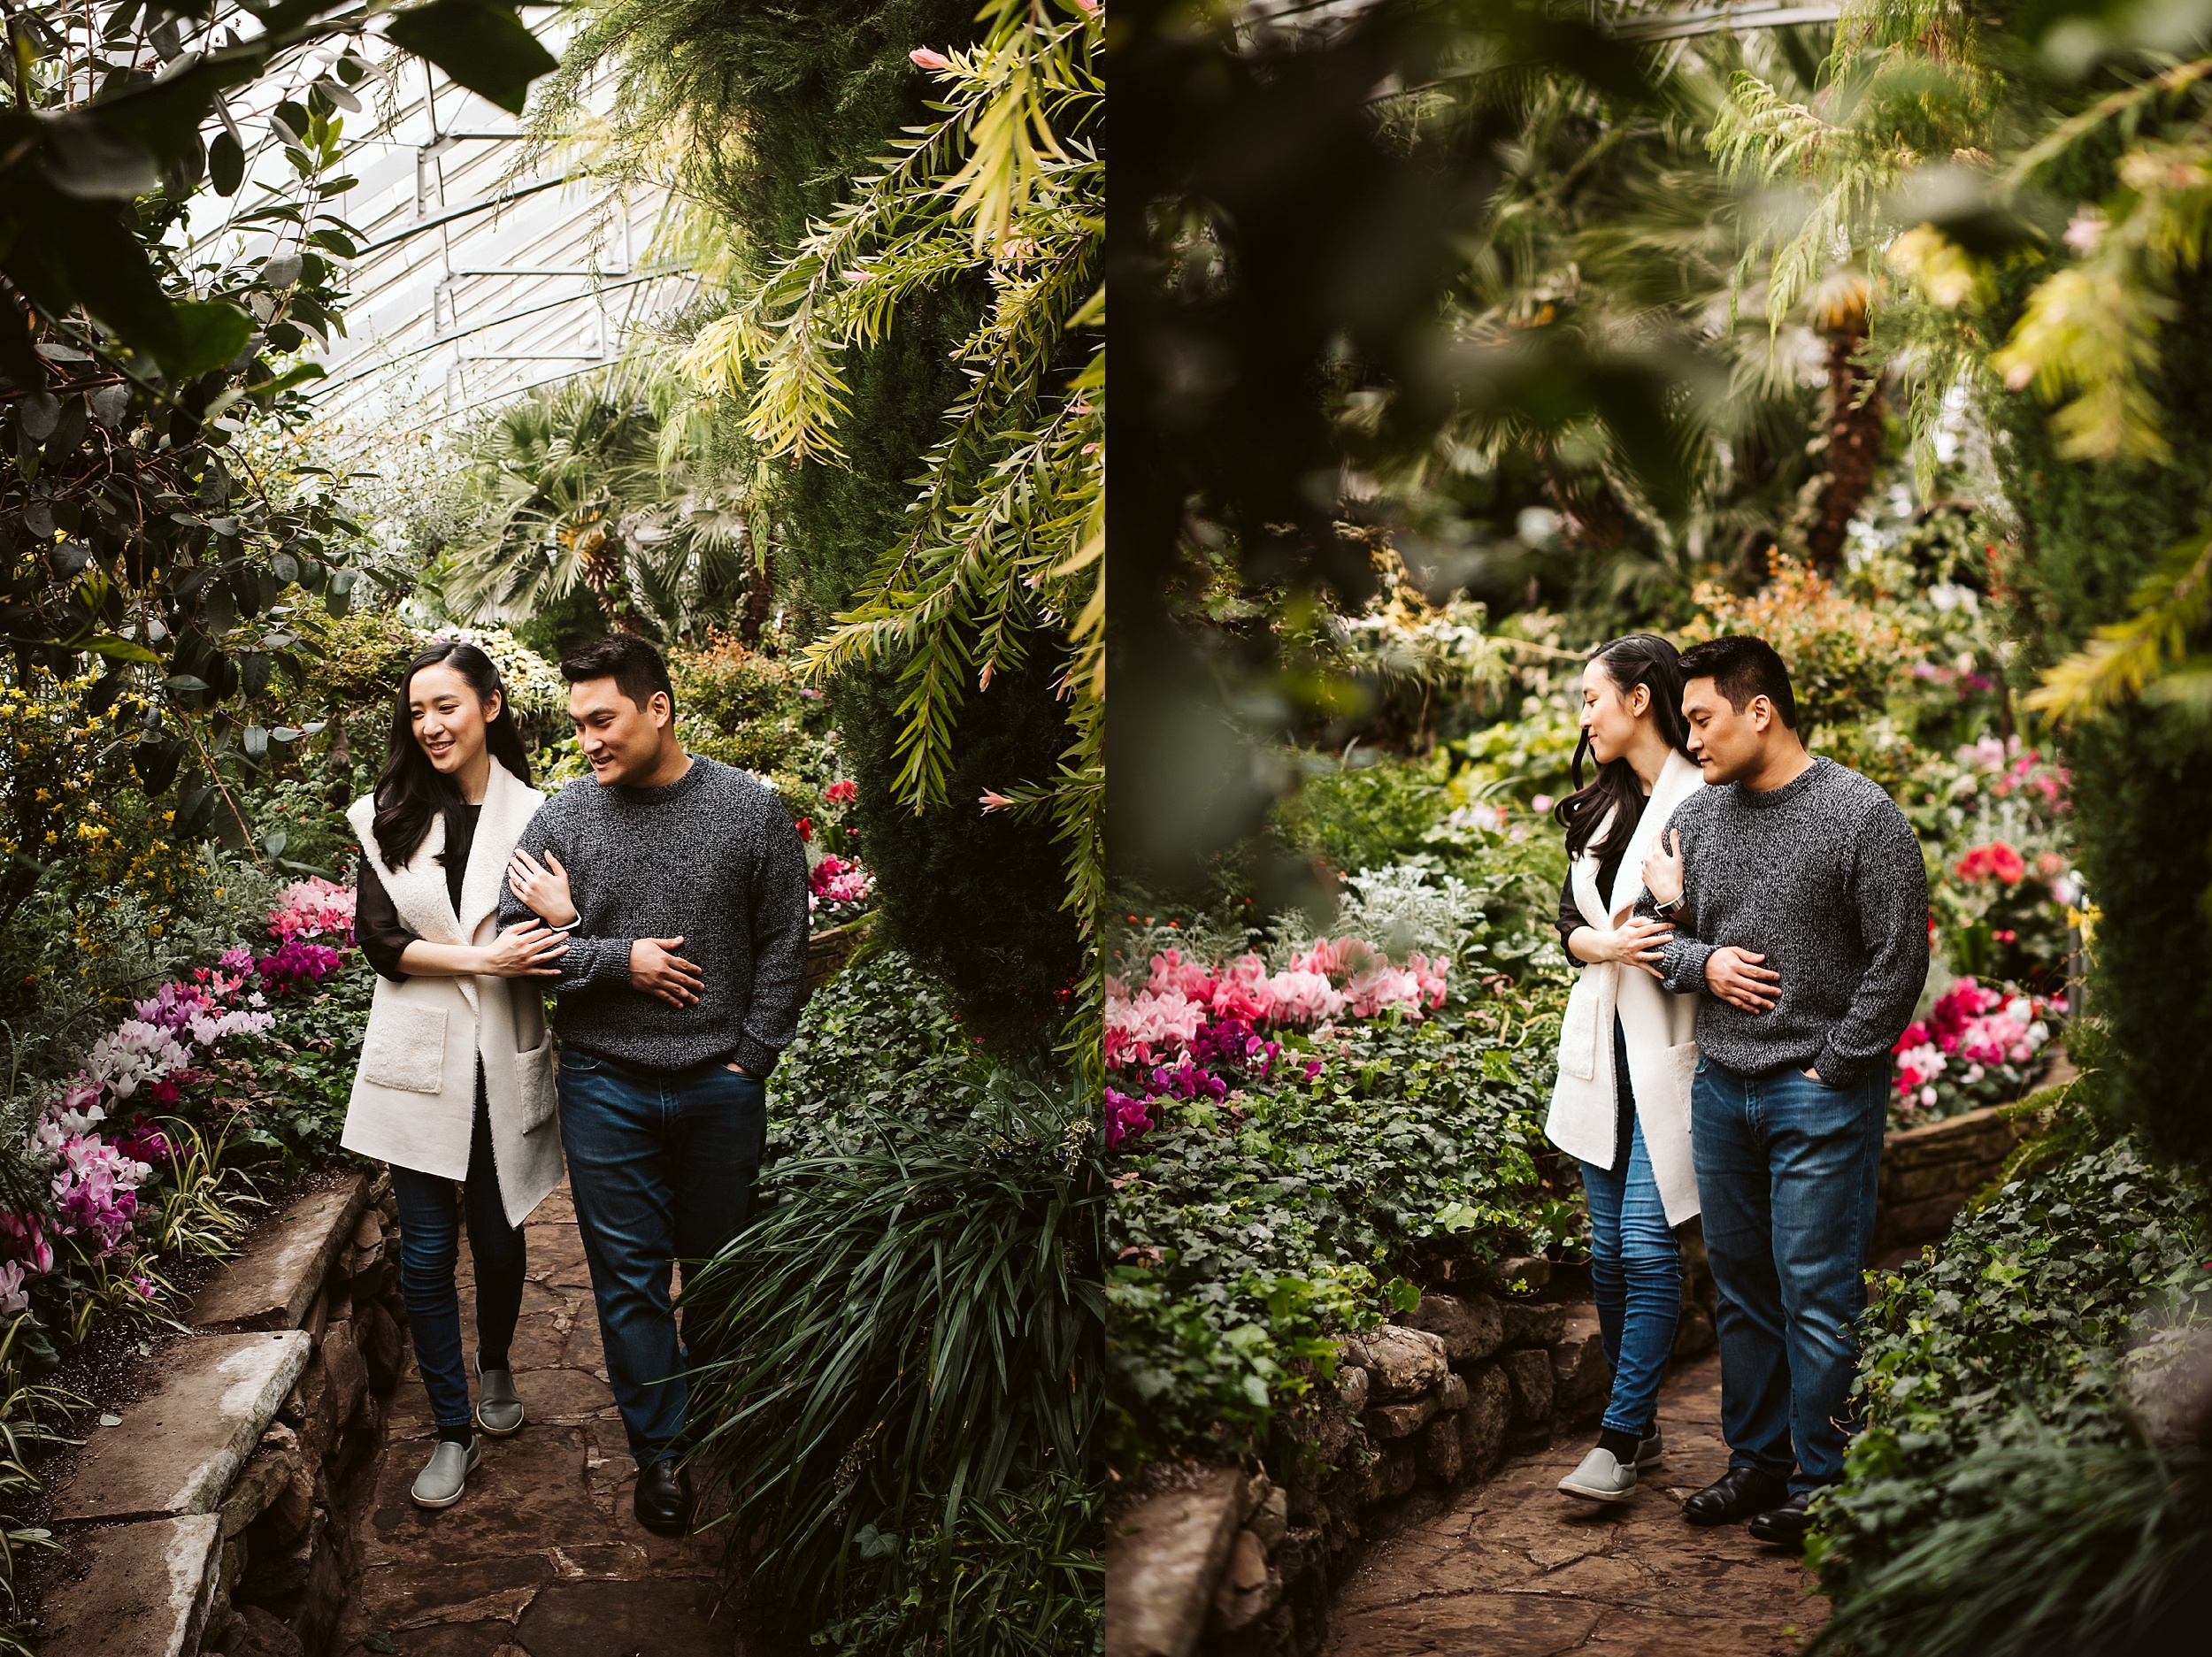 Allan_Gardens_Engagement_Shoot_Toronto_Wedding_Photographer_0008.jpg